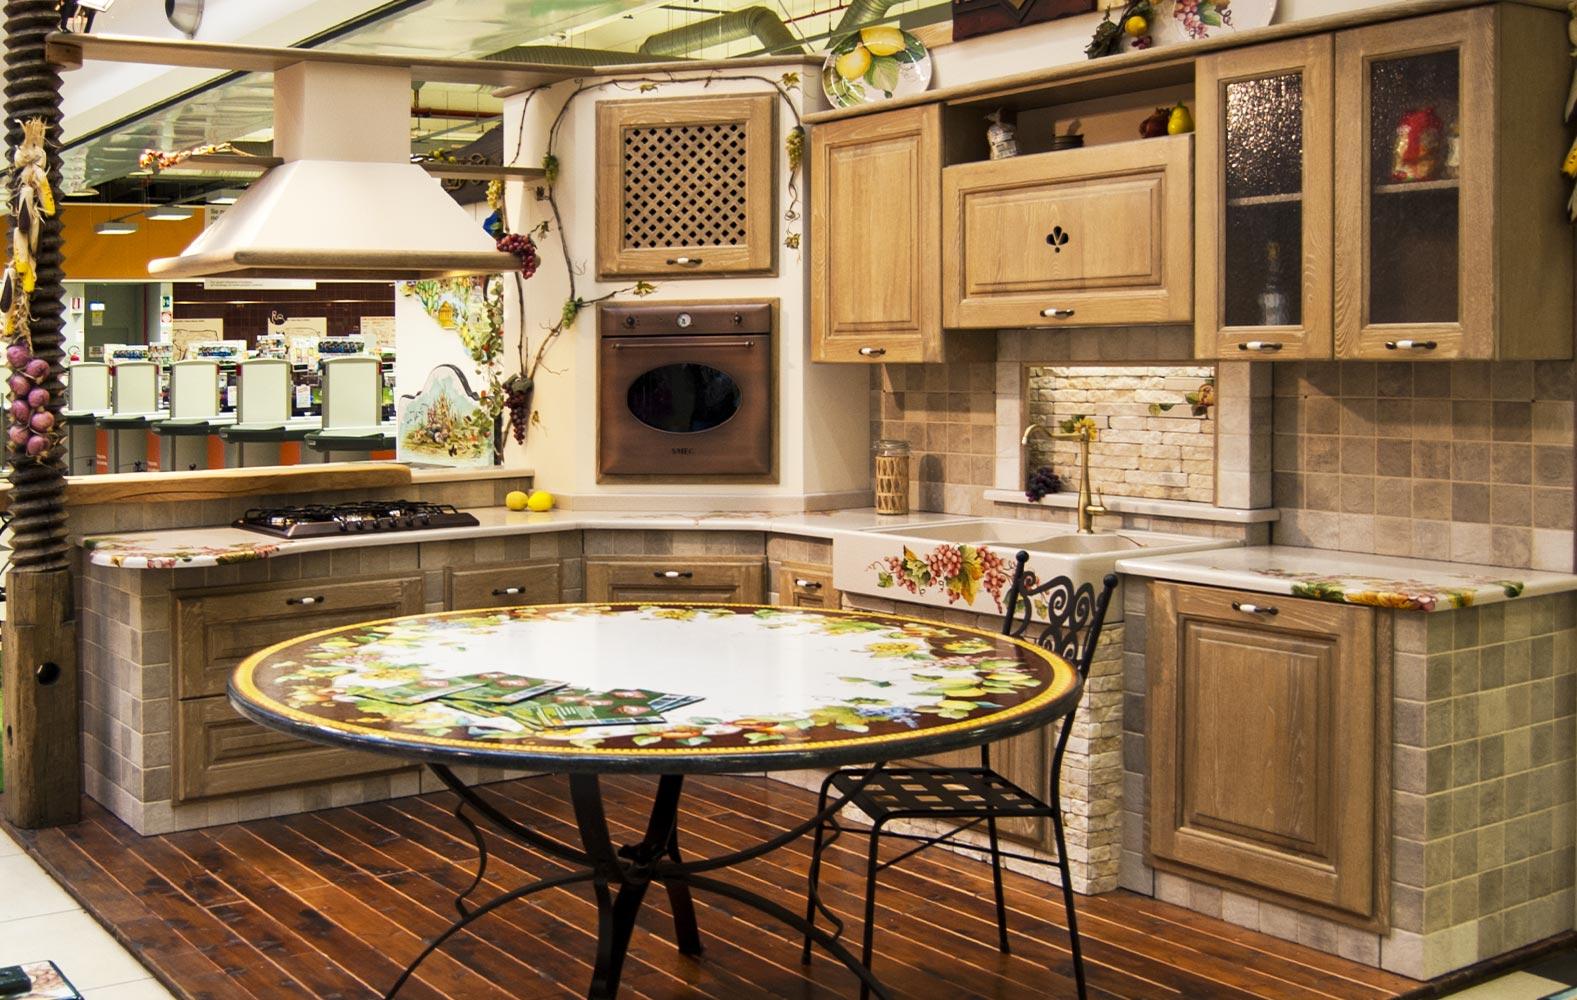 Penisola Cucina In Muratura cucine in muratura smontabile con top decorati a mano